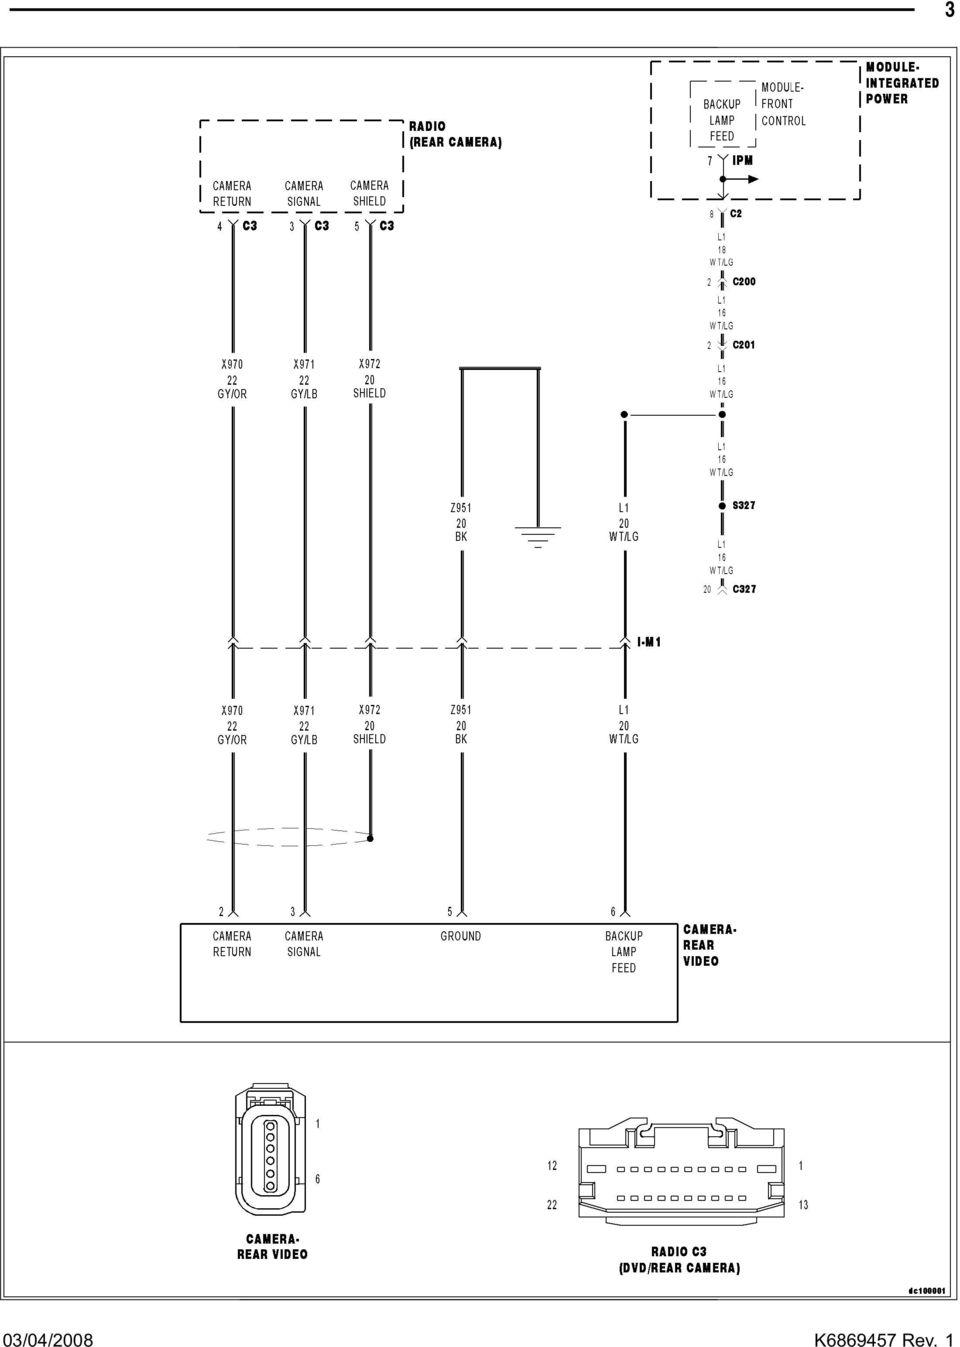 Wiring Diagram Jeep Grand Cherokee 2008 - Basic Boat Wiring Diagram Trailer  - sportster-wiring.yenpancane.jeanjaures37.fr